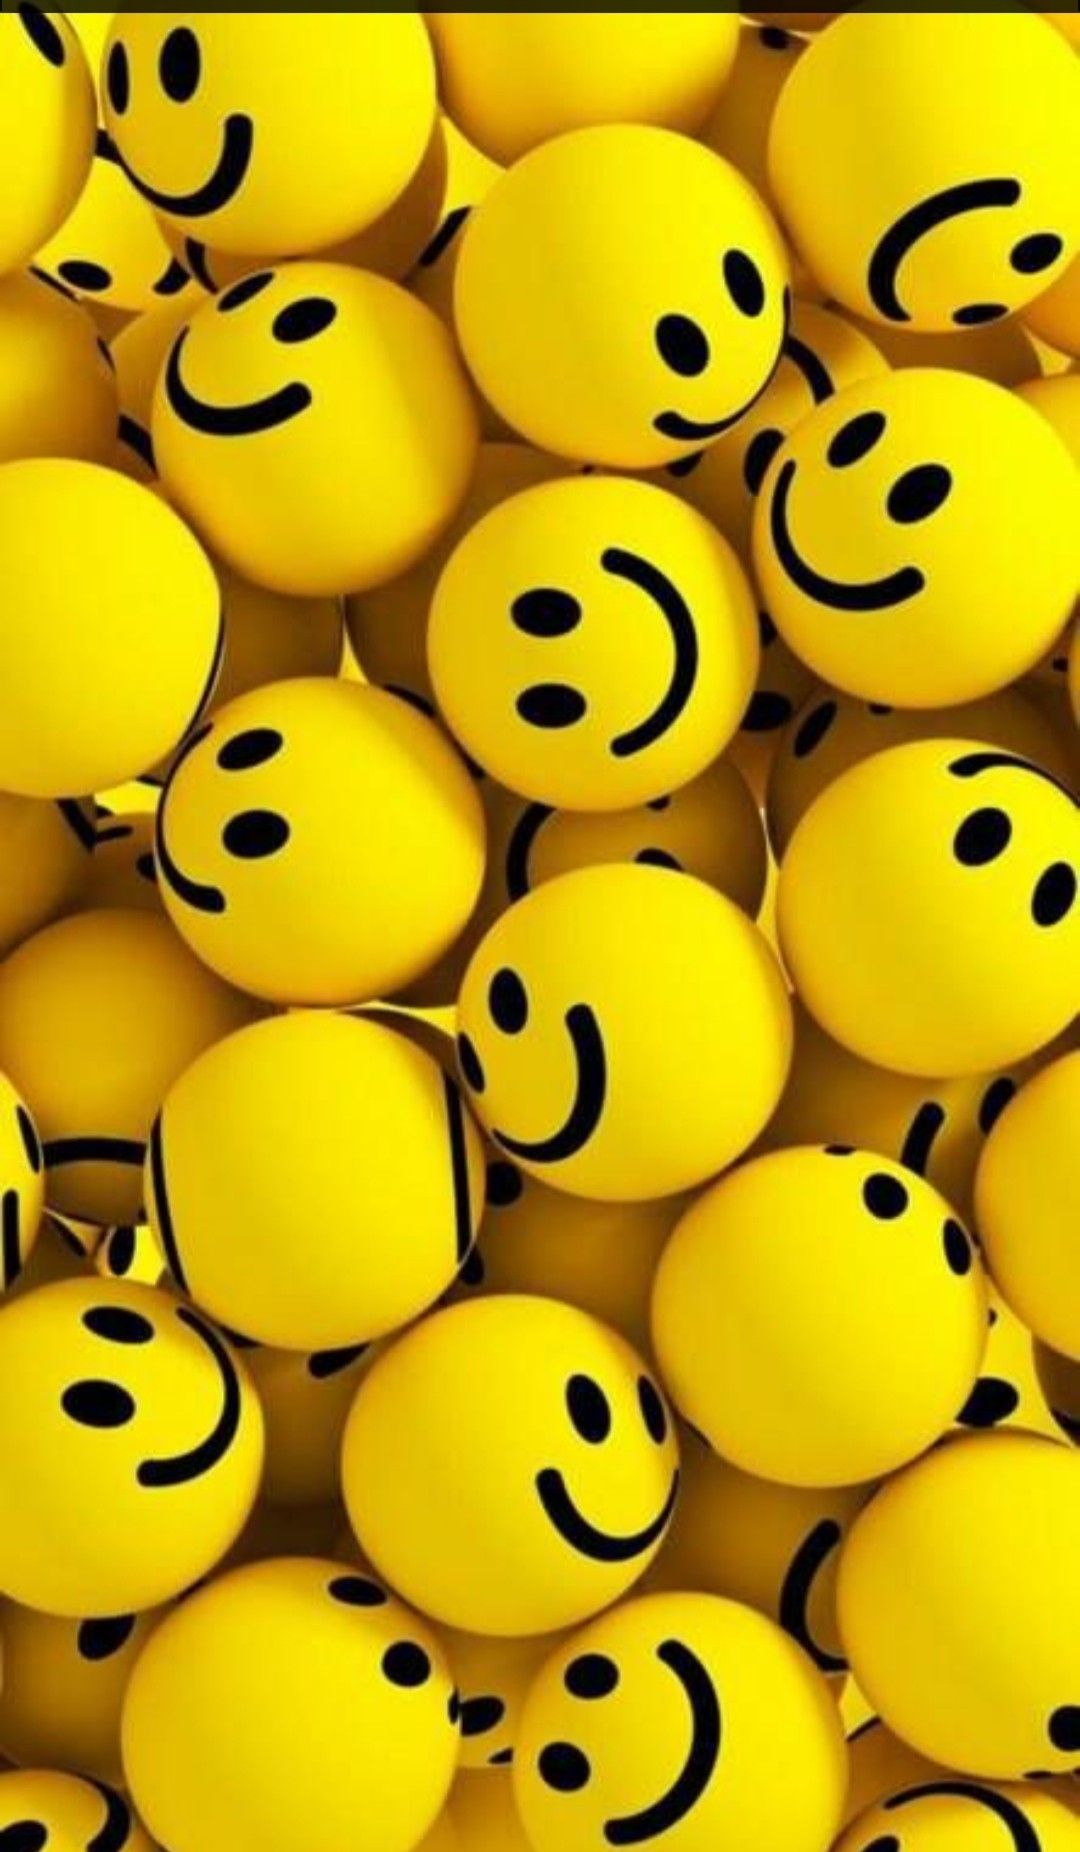 smile//face(screenwallpaper) Emoji wallpaper, Mobile